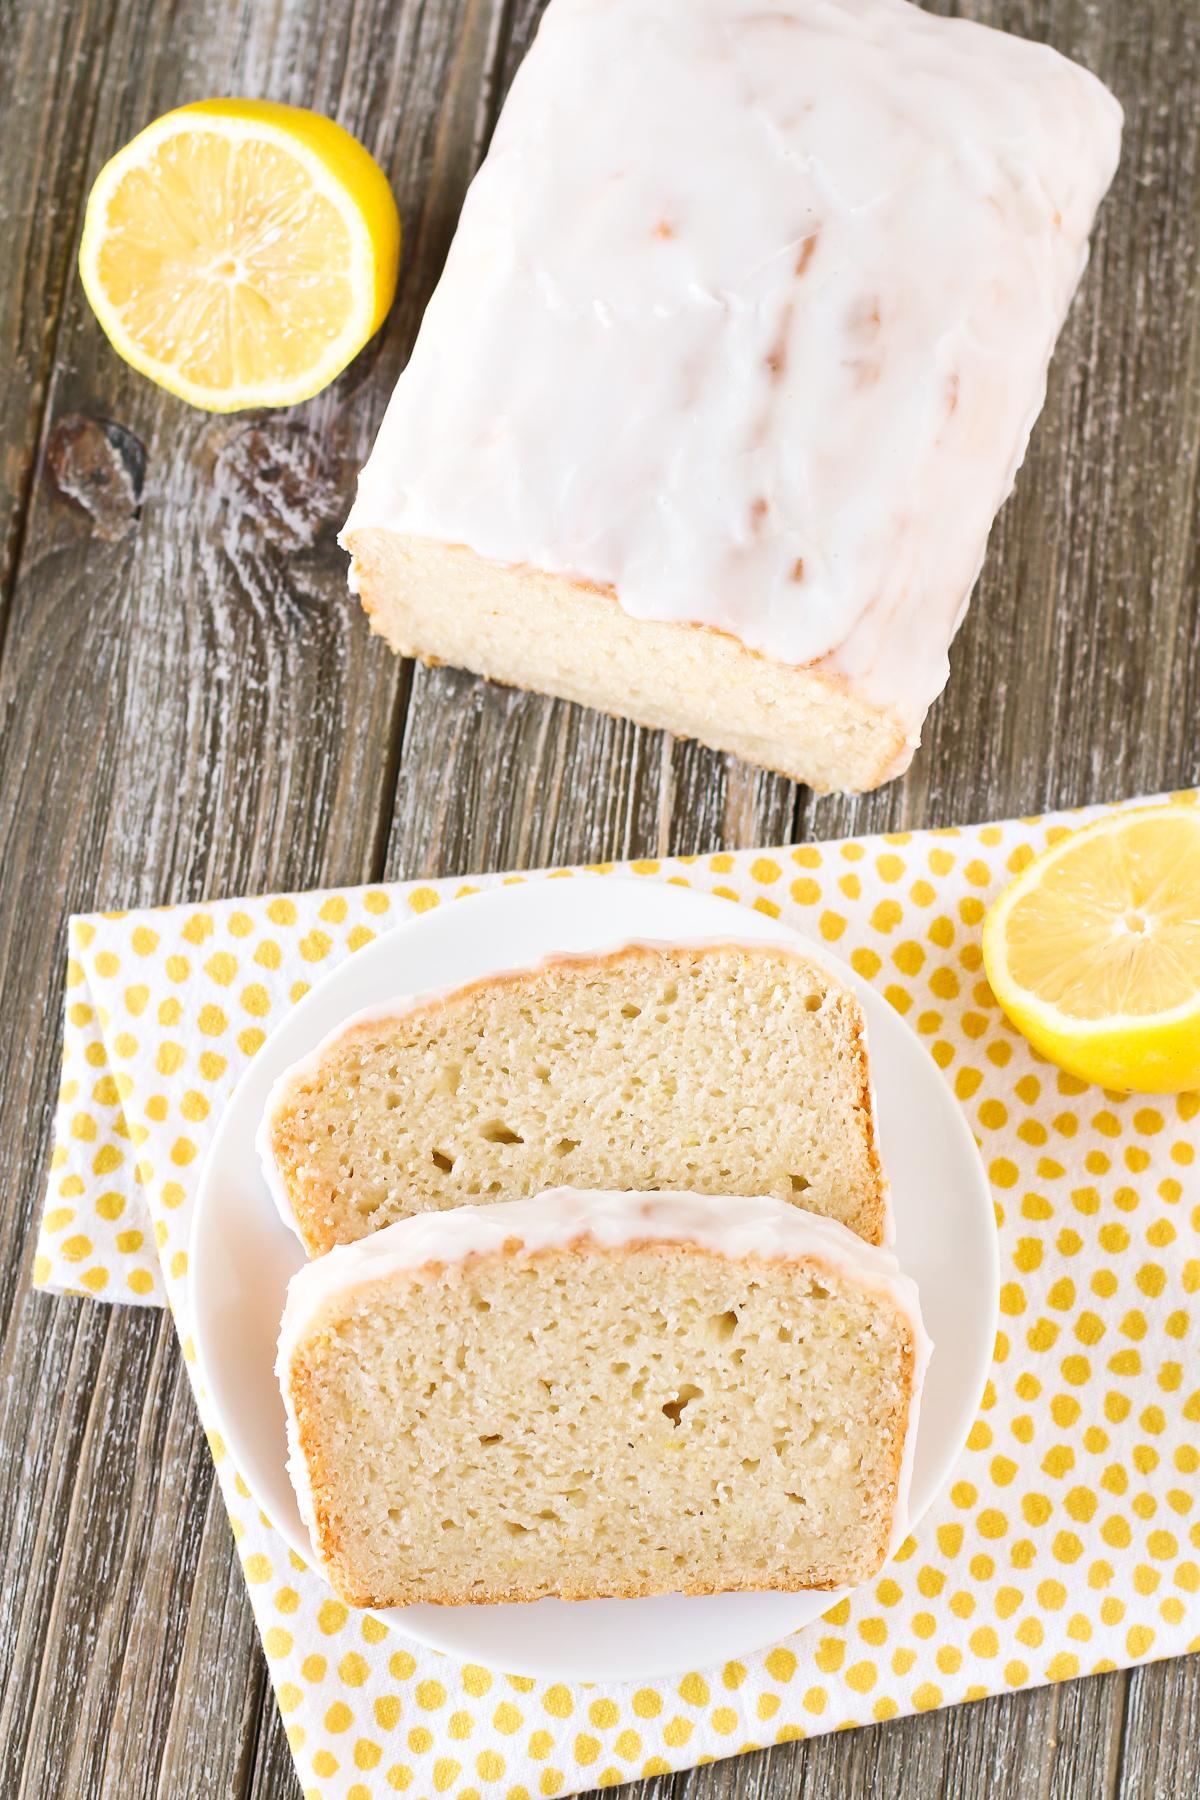 Gluten Free Vegan Glazed Lemon Pound Cake. Moist lemon cake with a simple lemon glaze. You will for sure go back for a second slice!